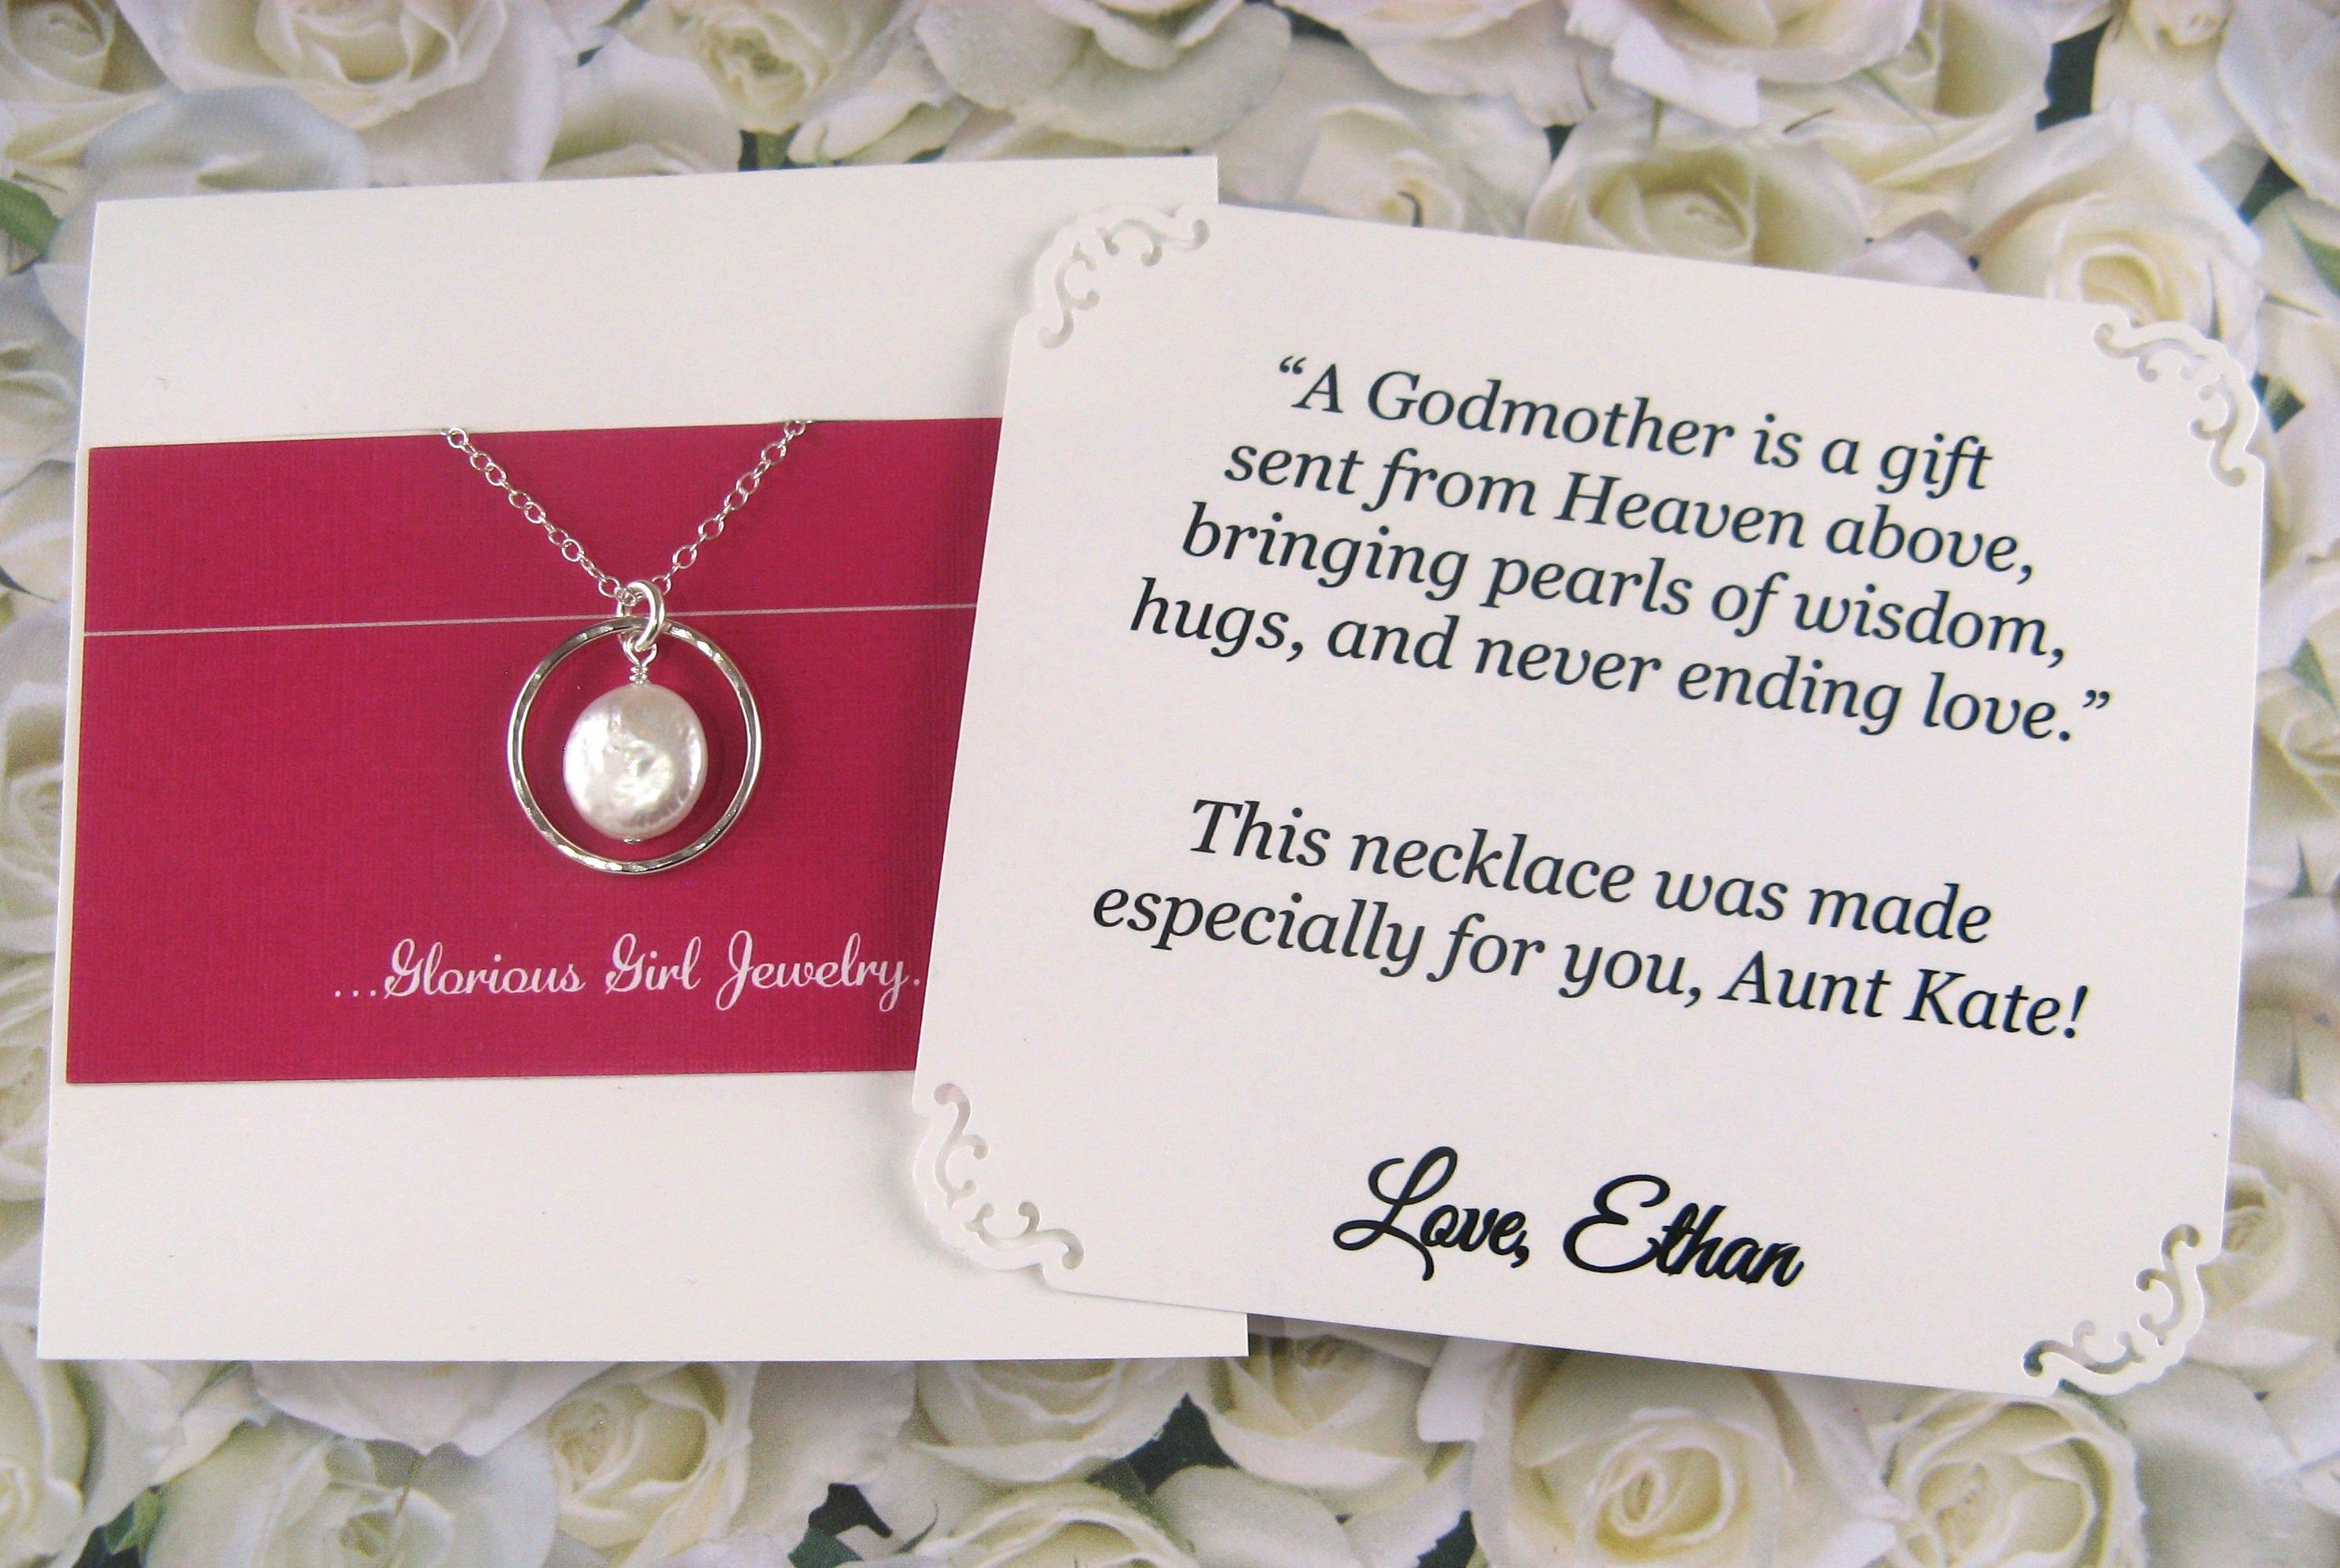 Contemporary Wedding Invitation Gift Poem Inspiration - Wedding Idea ...